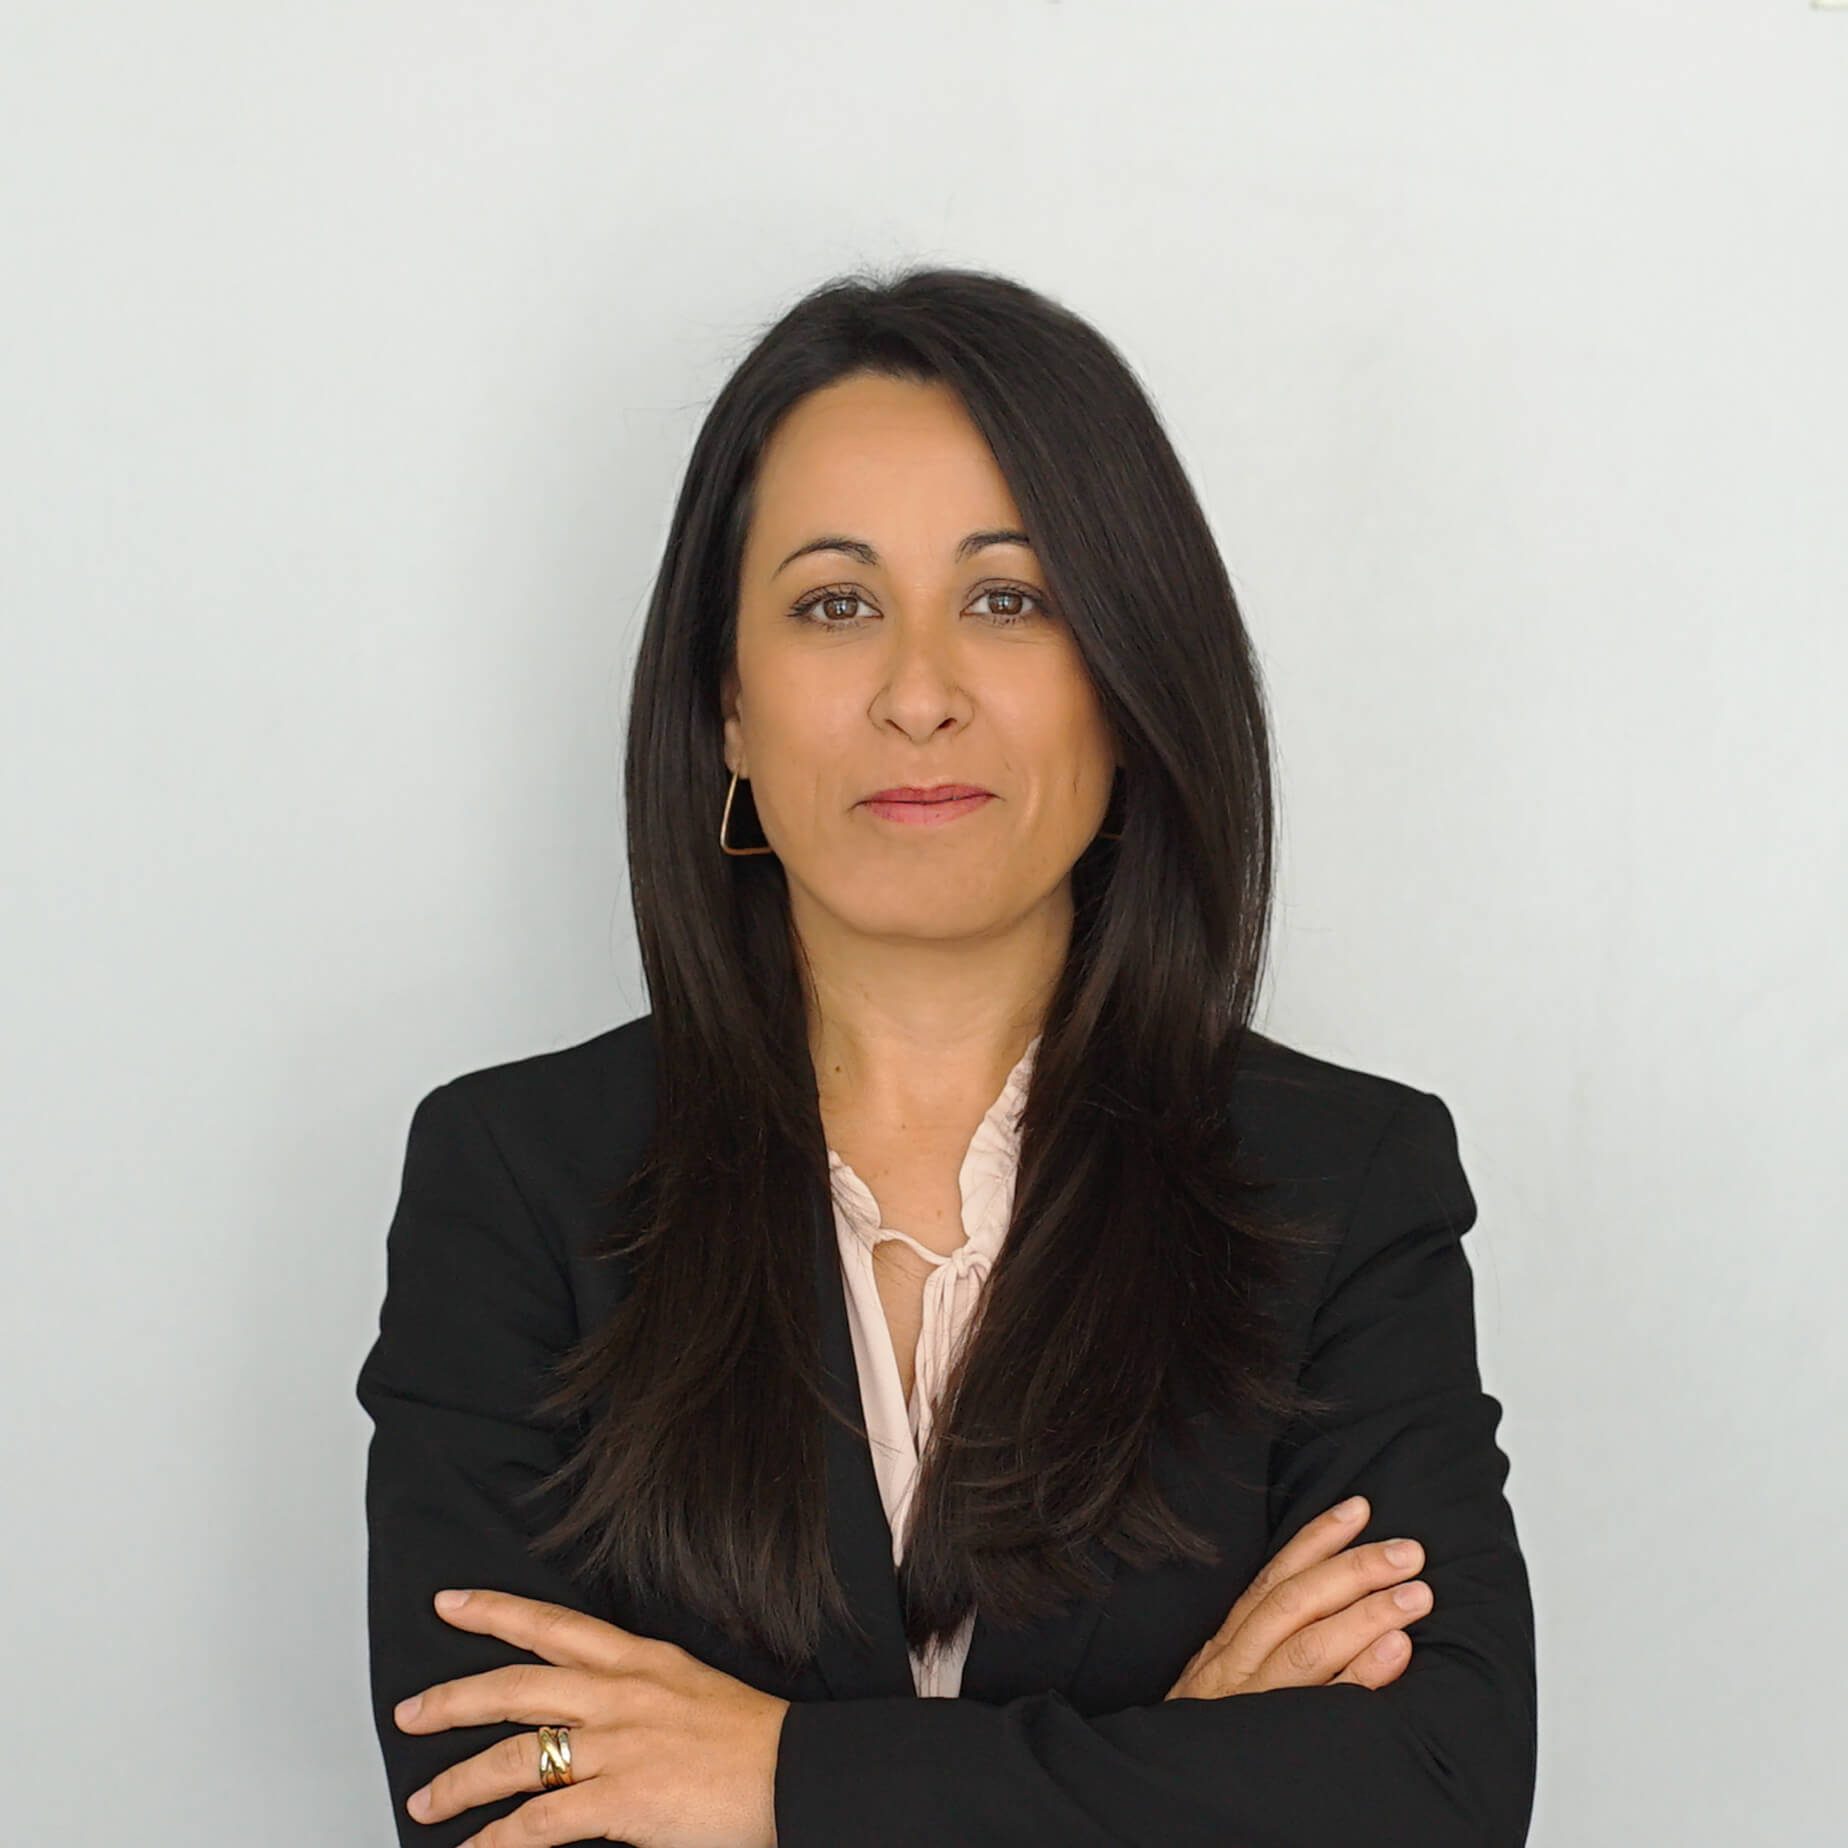 Natália Cunha - Senior Manager @ IT People Innovation